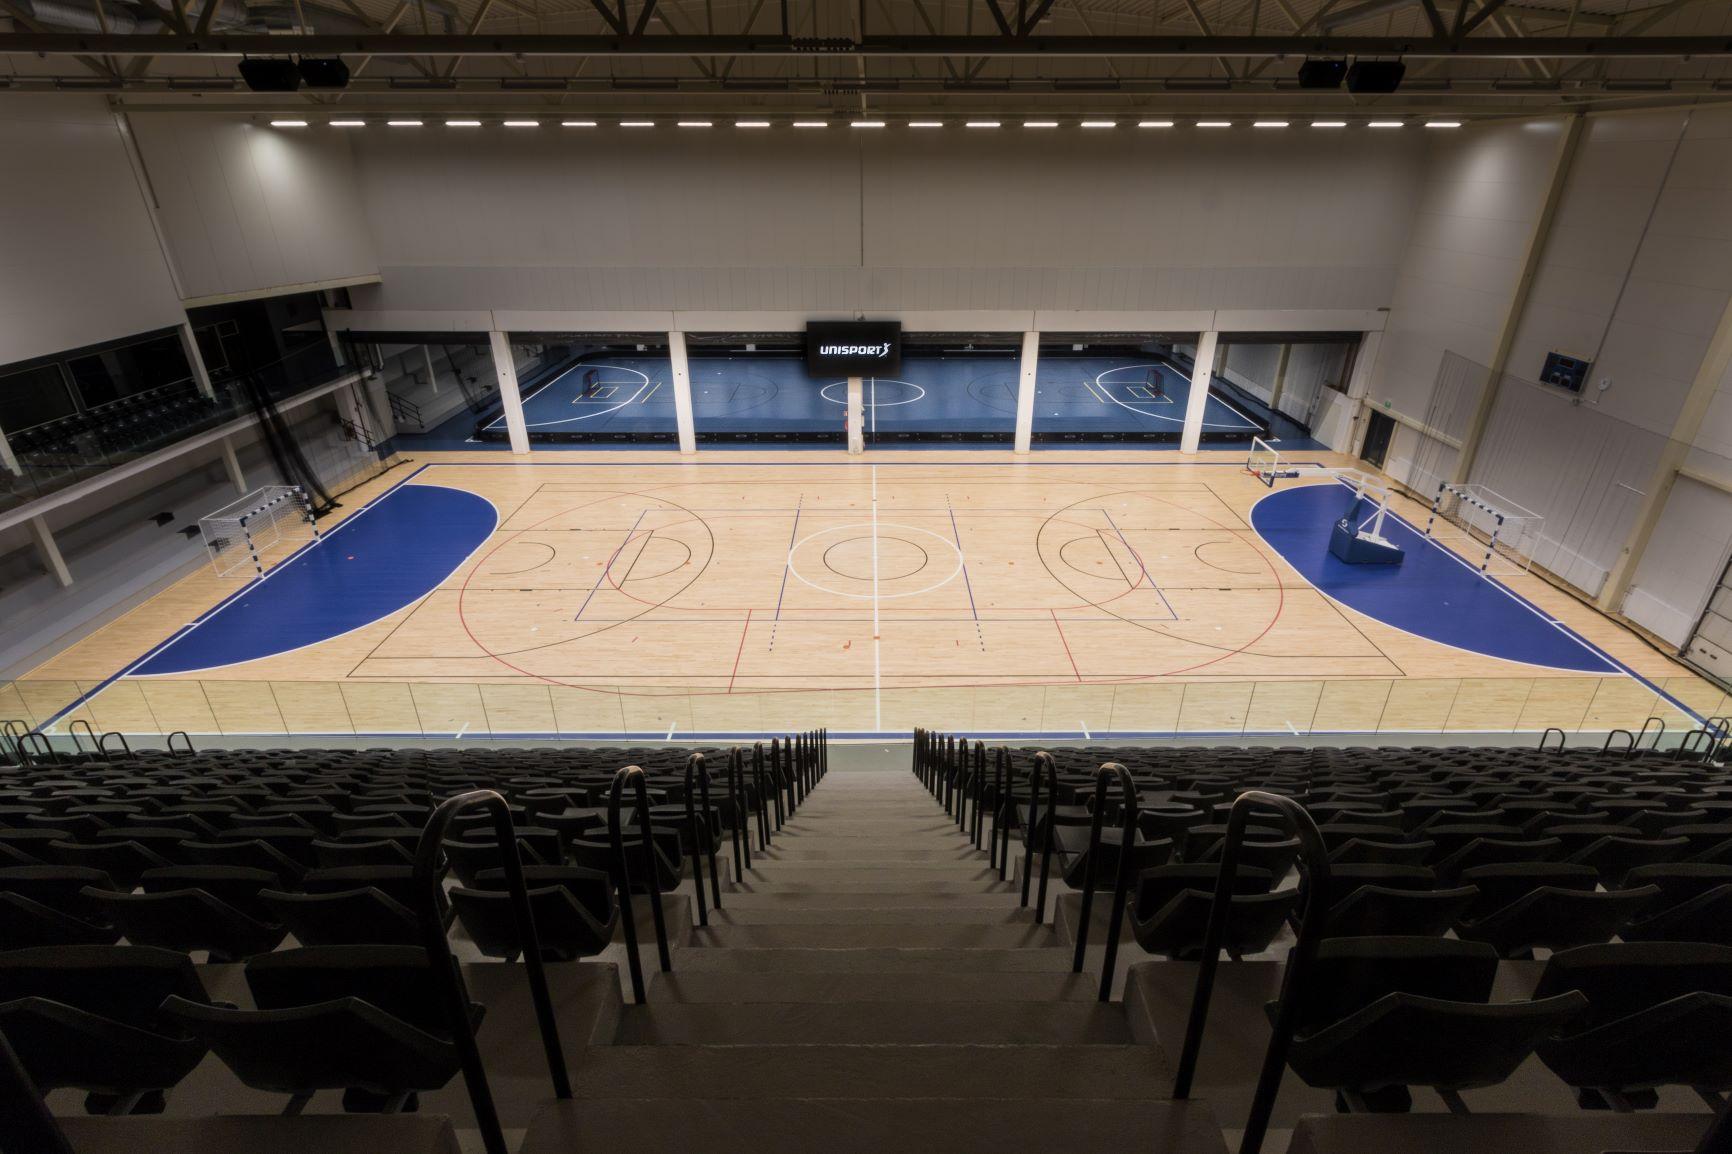 Unisport urheilulattia Kauppi Sports Center